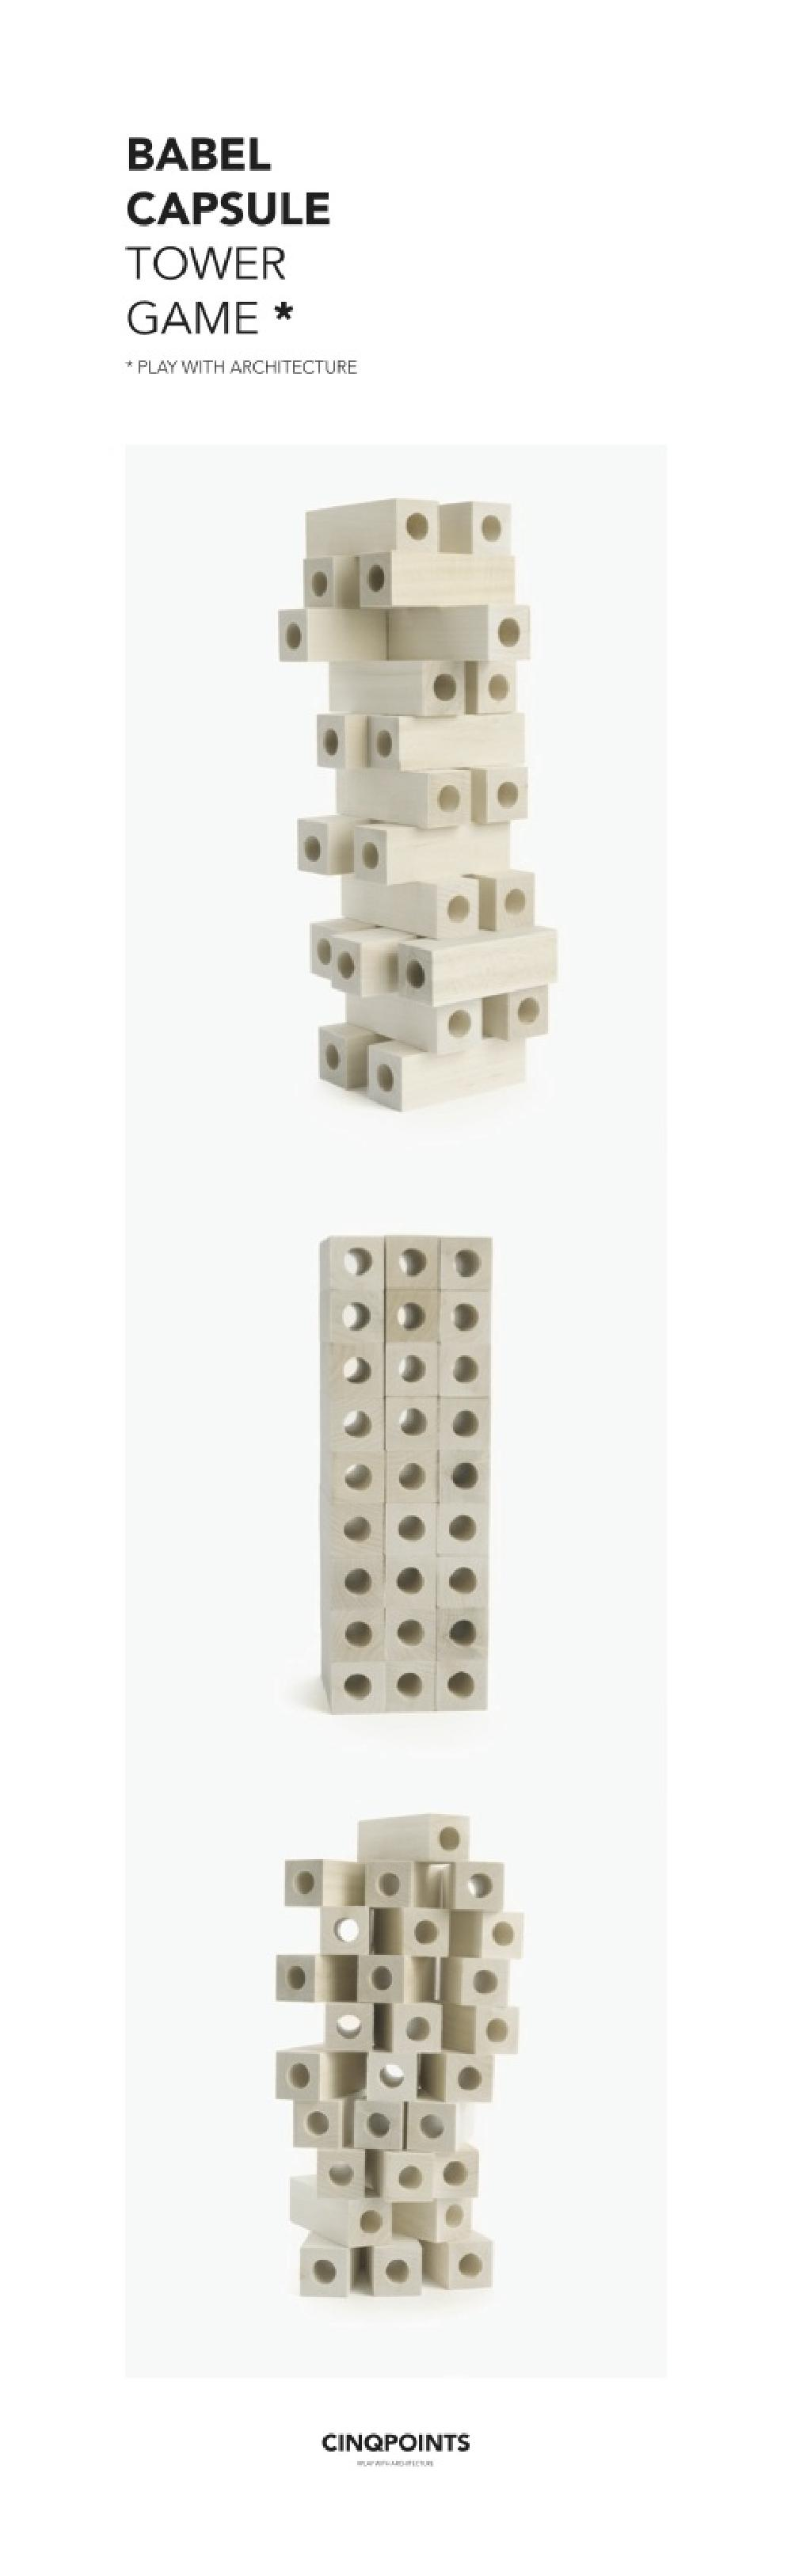 Babel Tower game (Capsule) / Jeu d'adresse